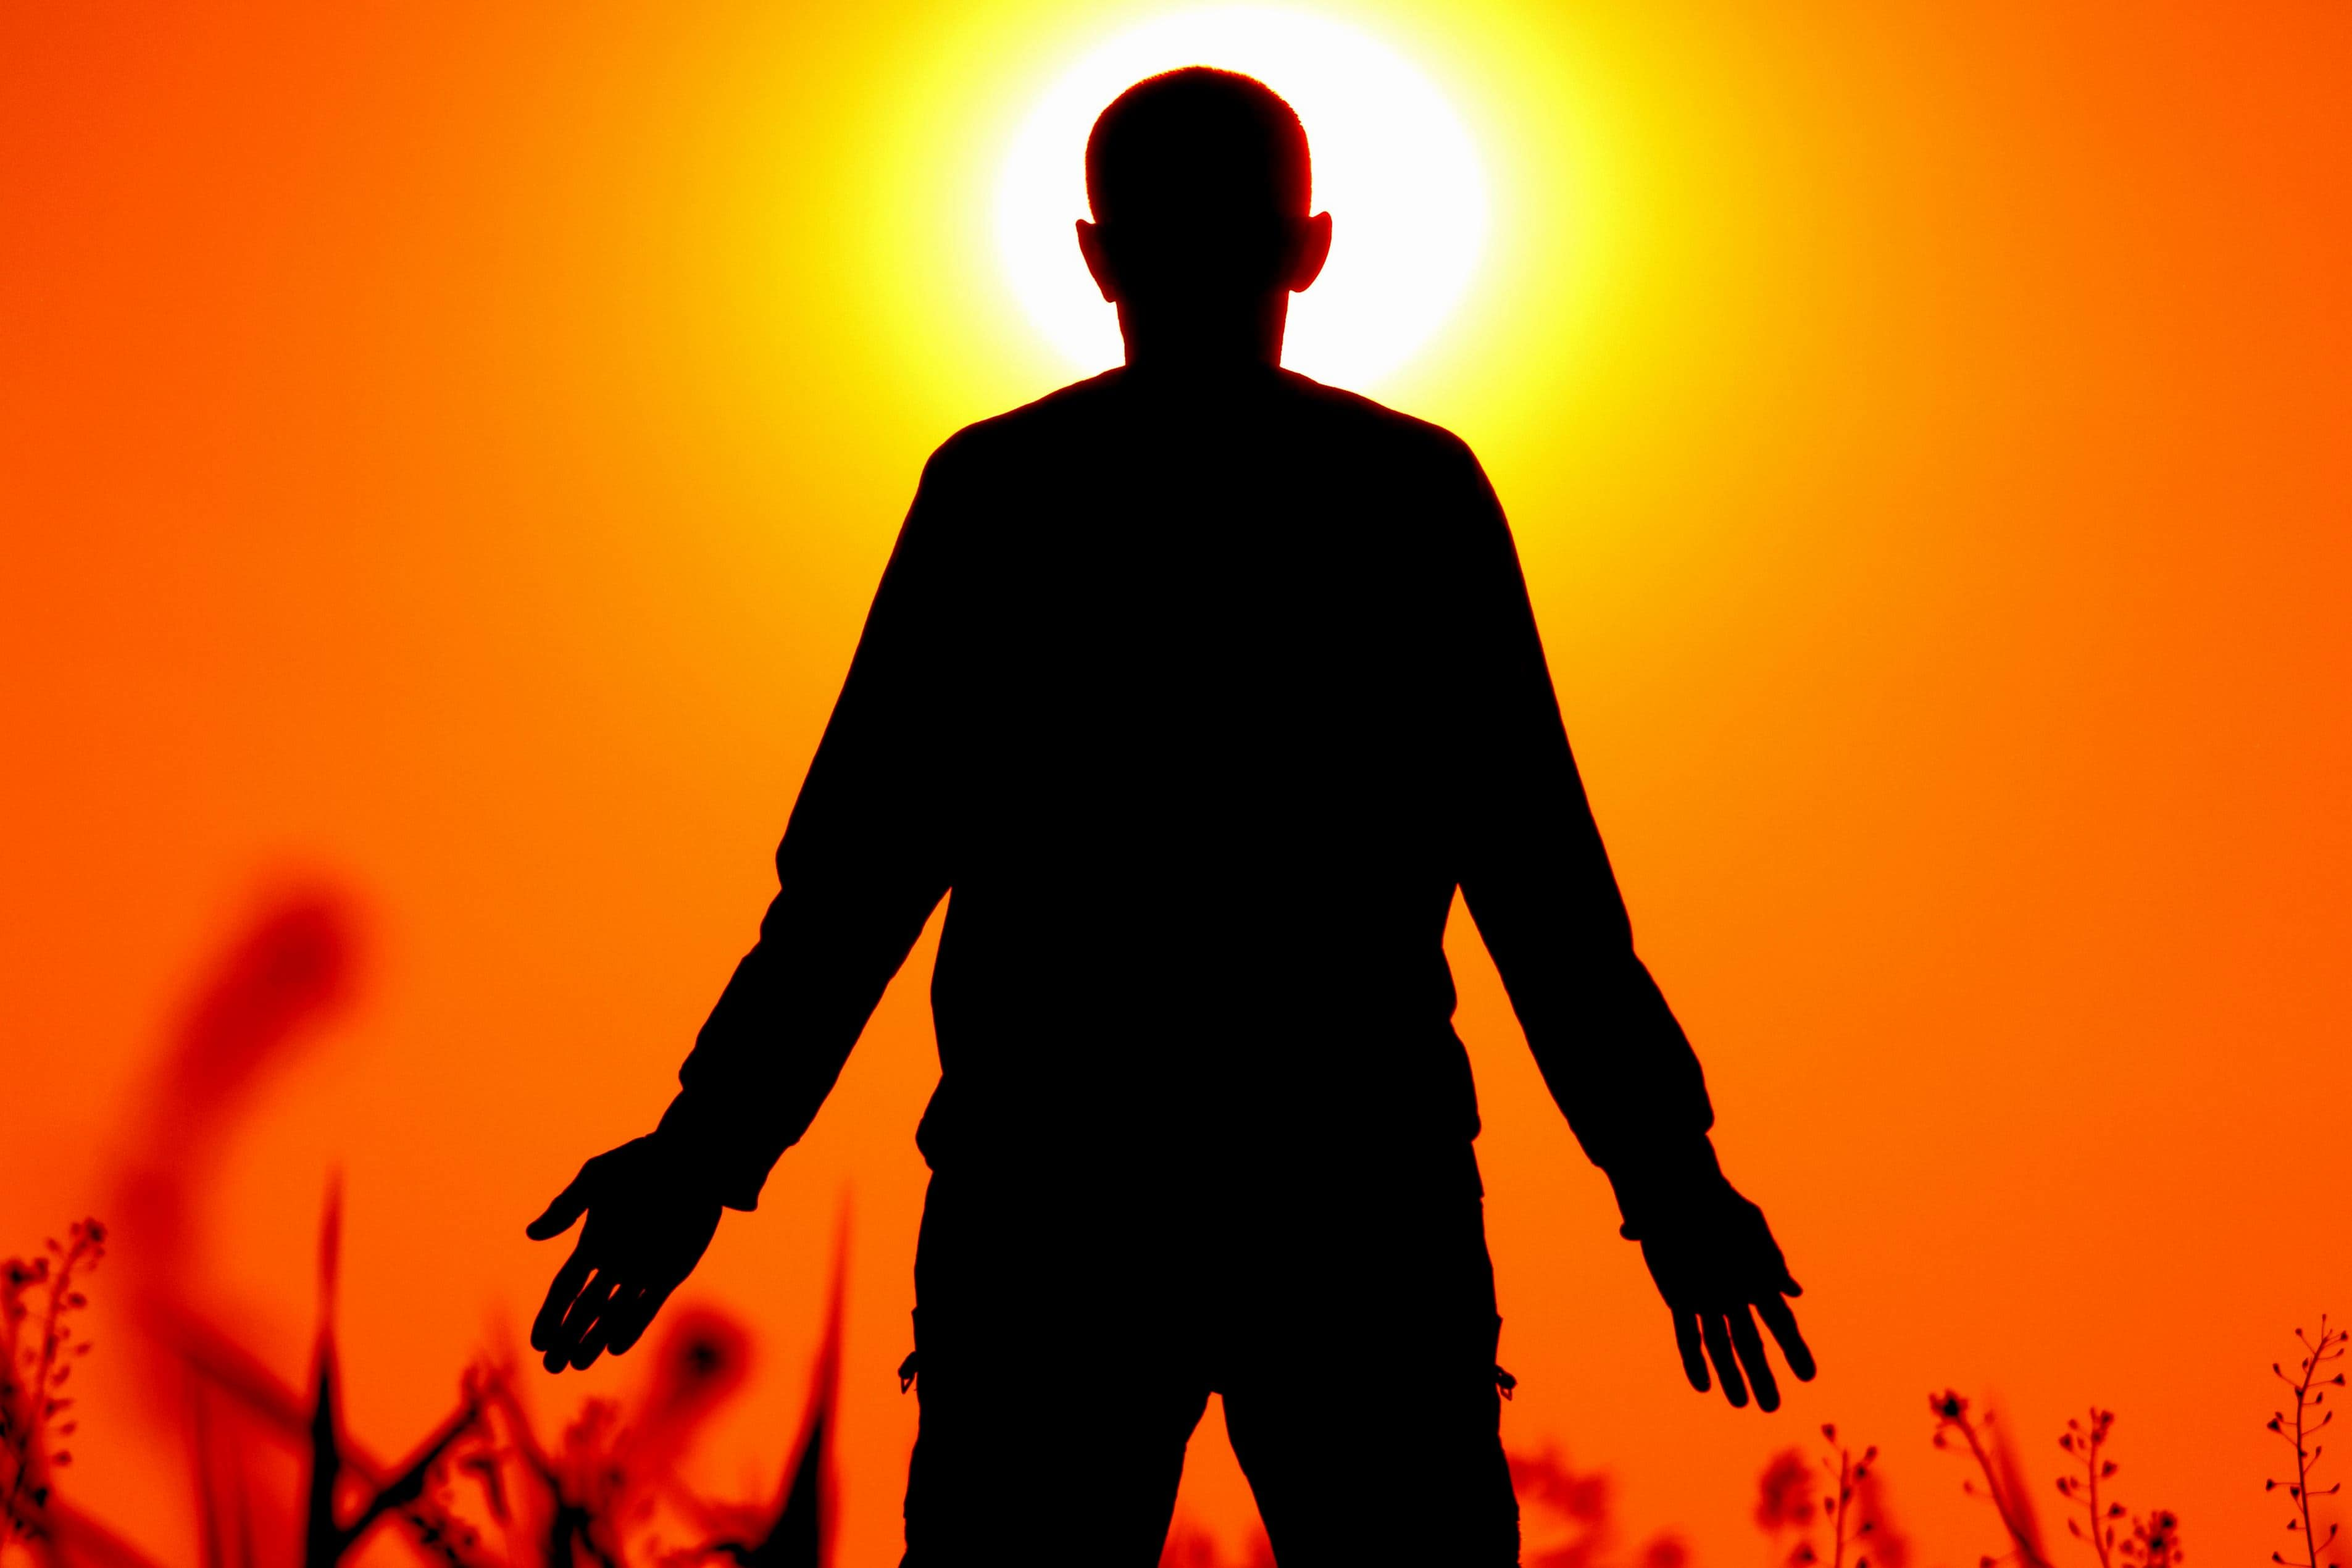 Gambar gratis siluet orang bayangan manusia tangan